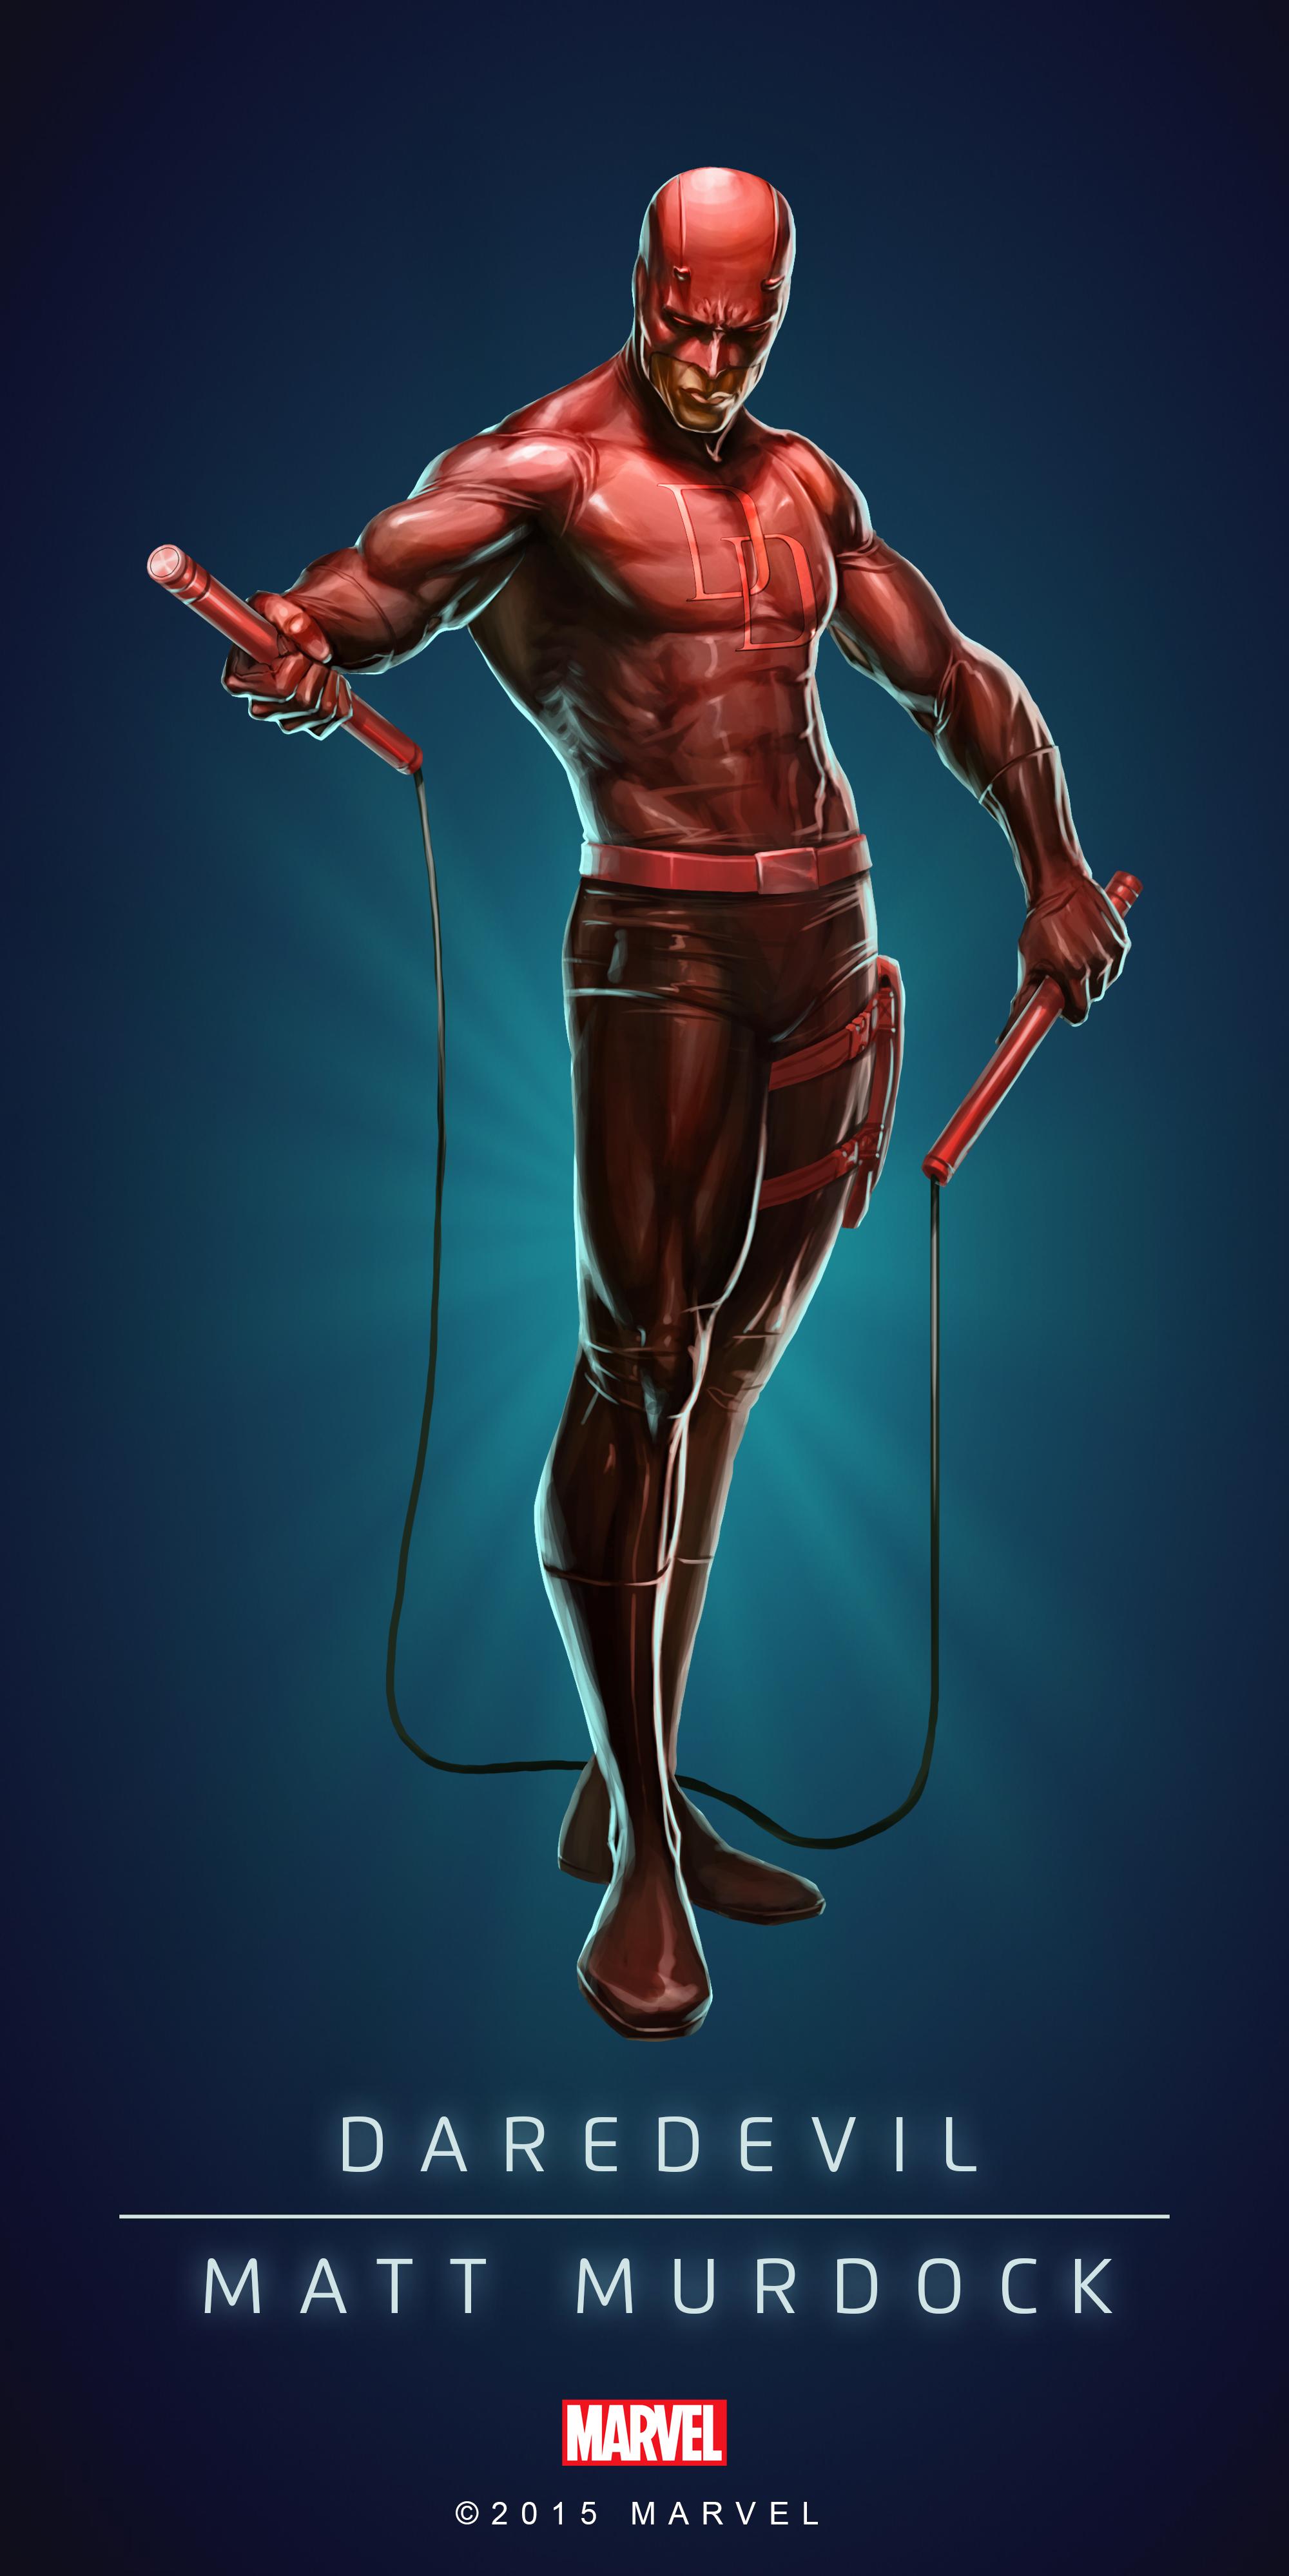 Daredevil_Poster_01.png (2000×3997)